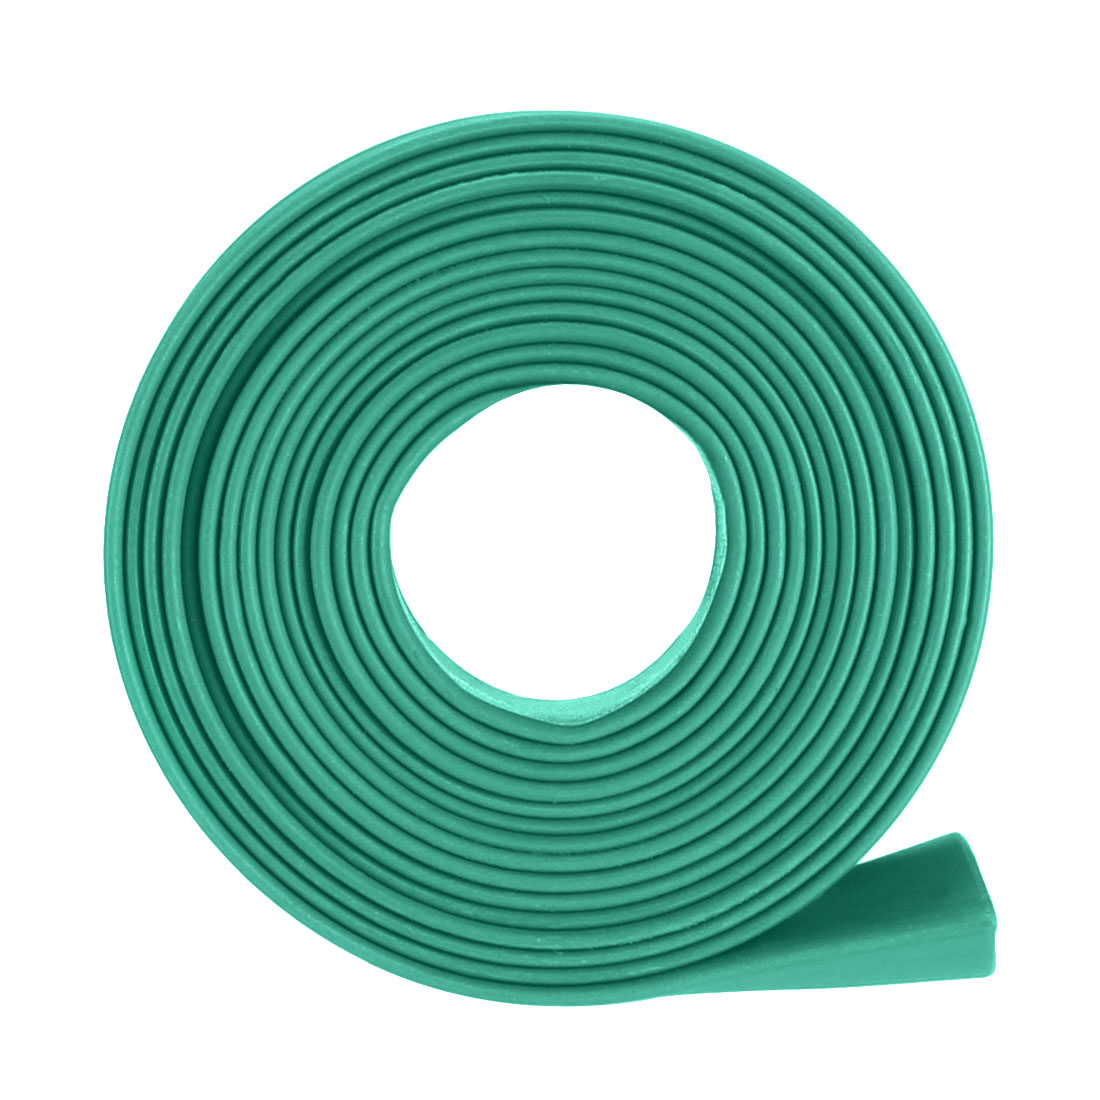 Heat Shrink Tube 2:1 Electrical Insulation Tubing Green 18 Diameter 1m Length